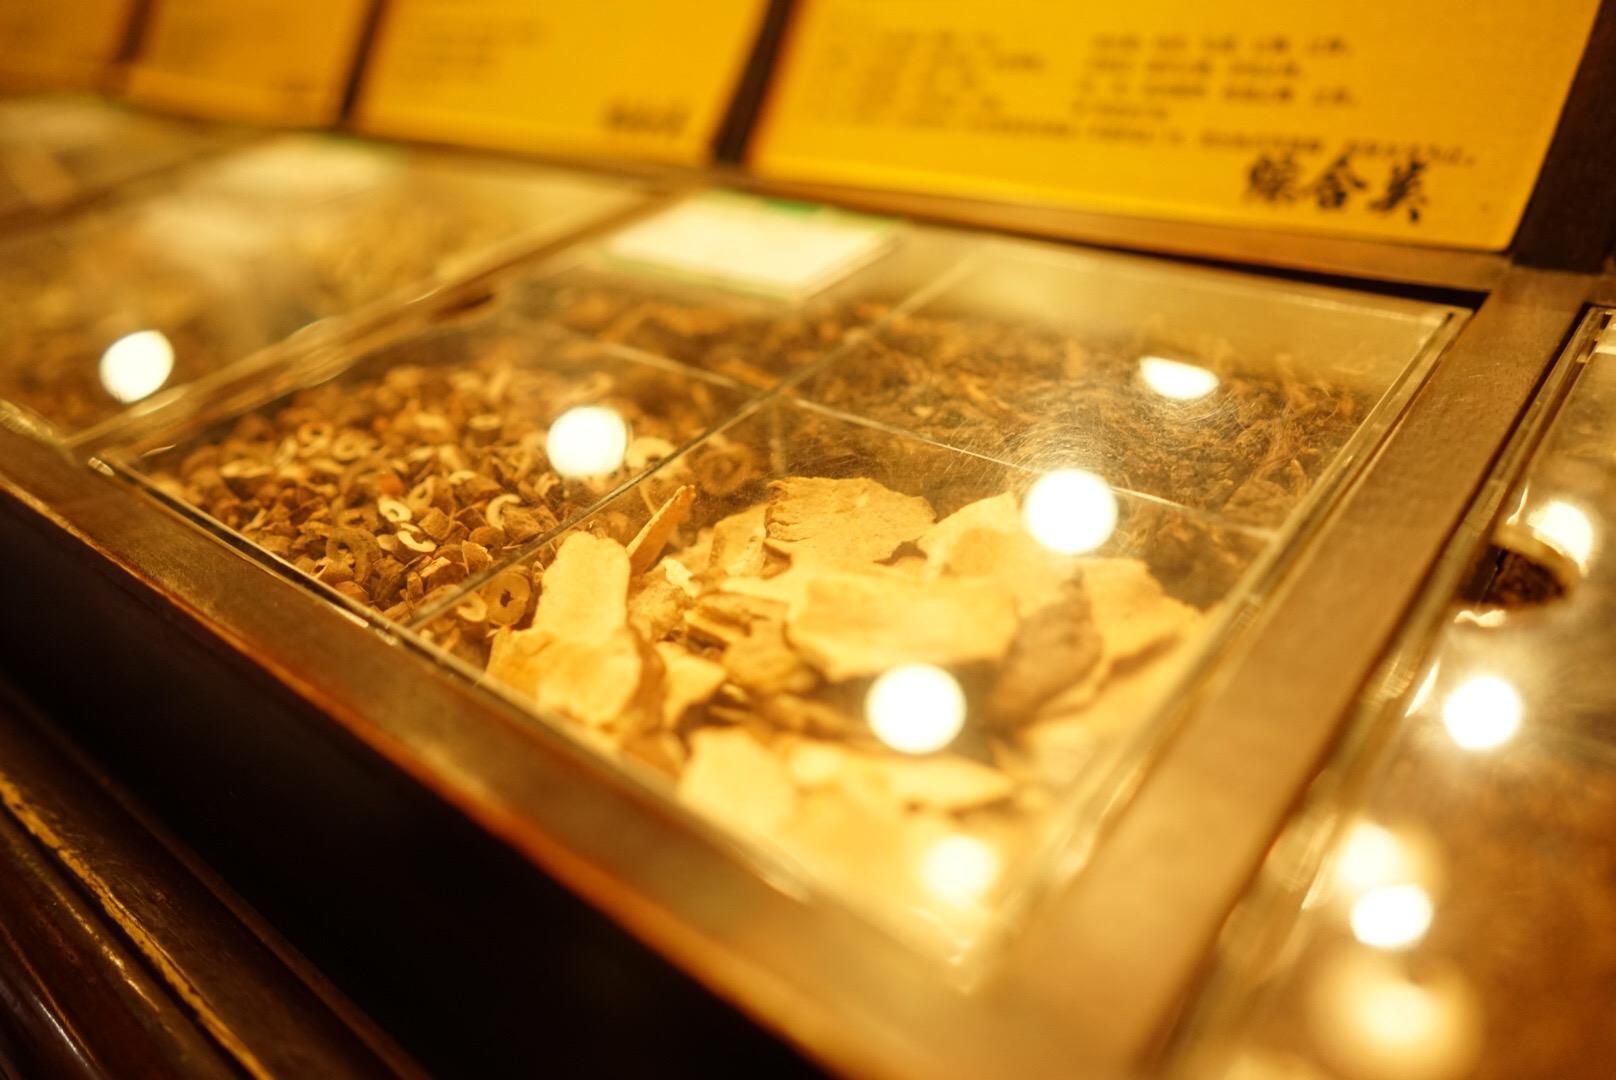 杭州の河坊街の漢方薬局回春堂(方回春堂)